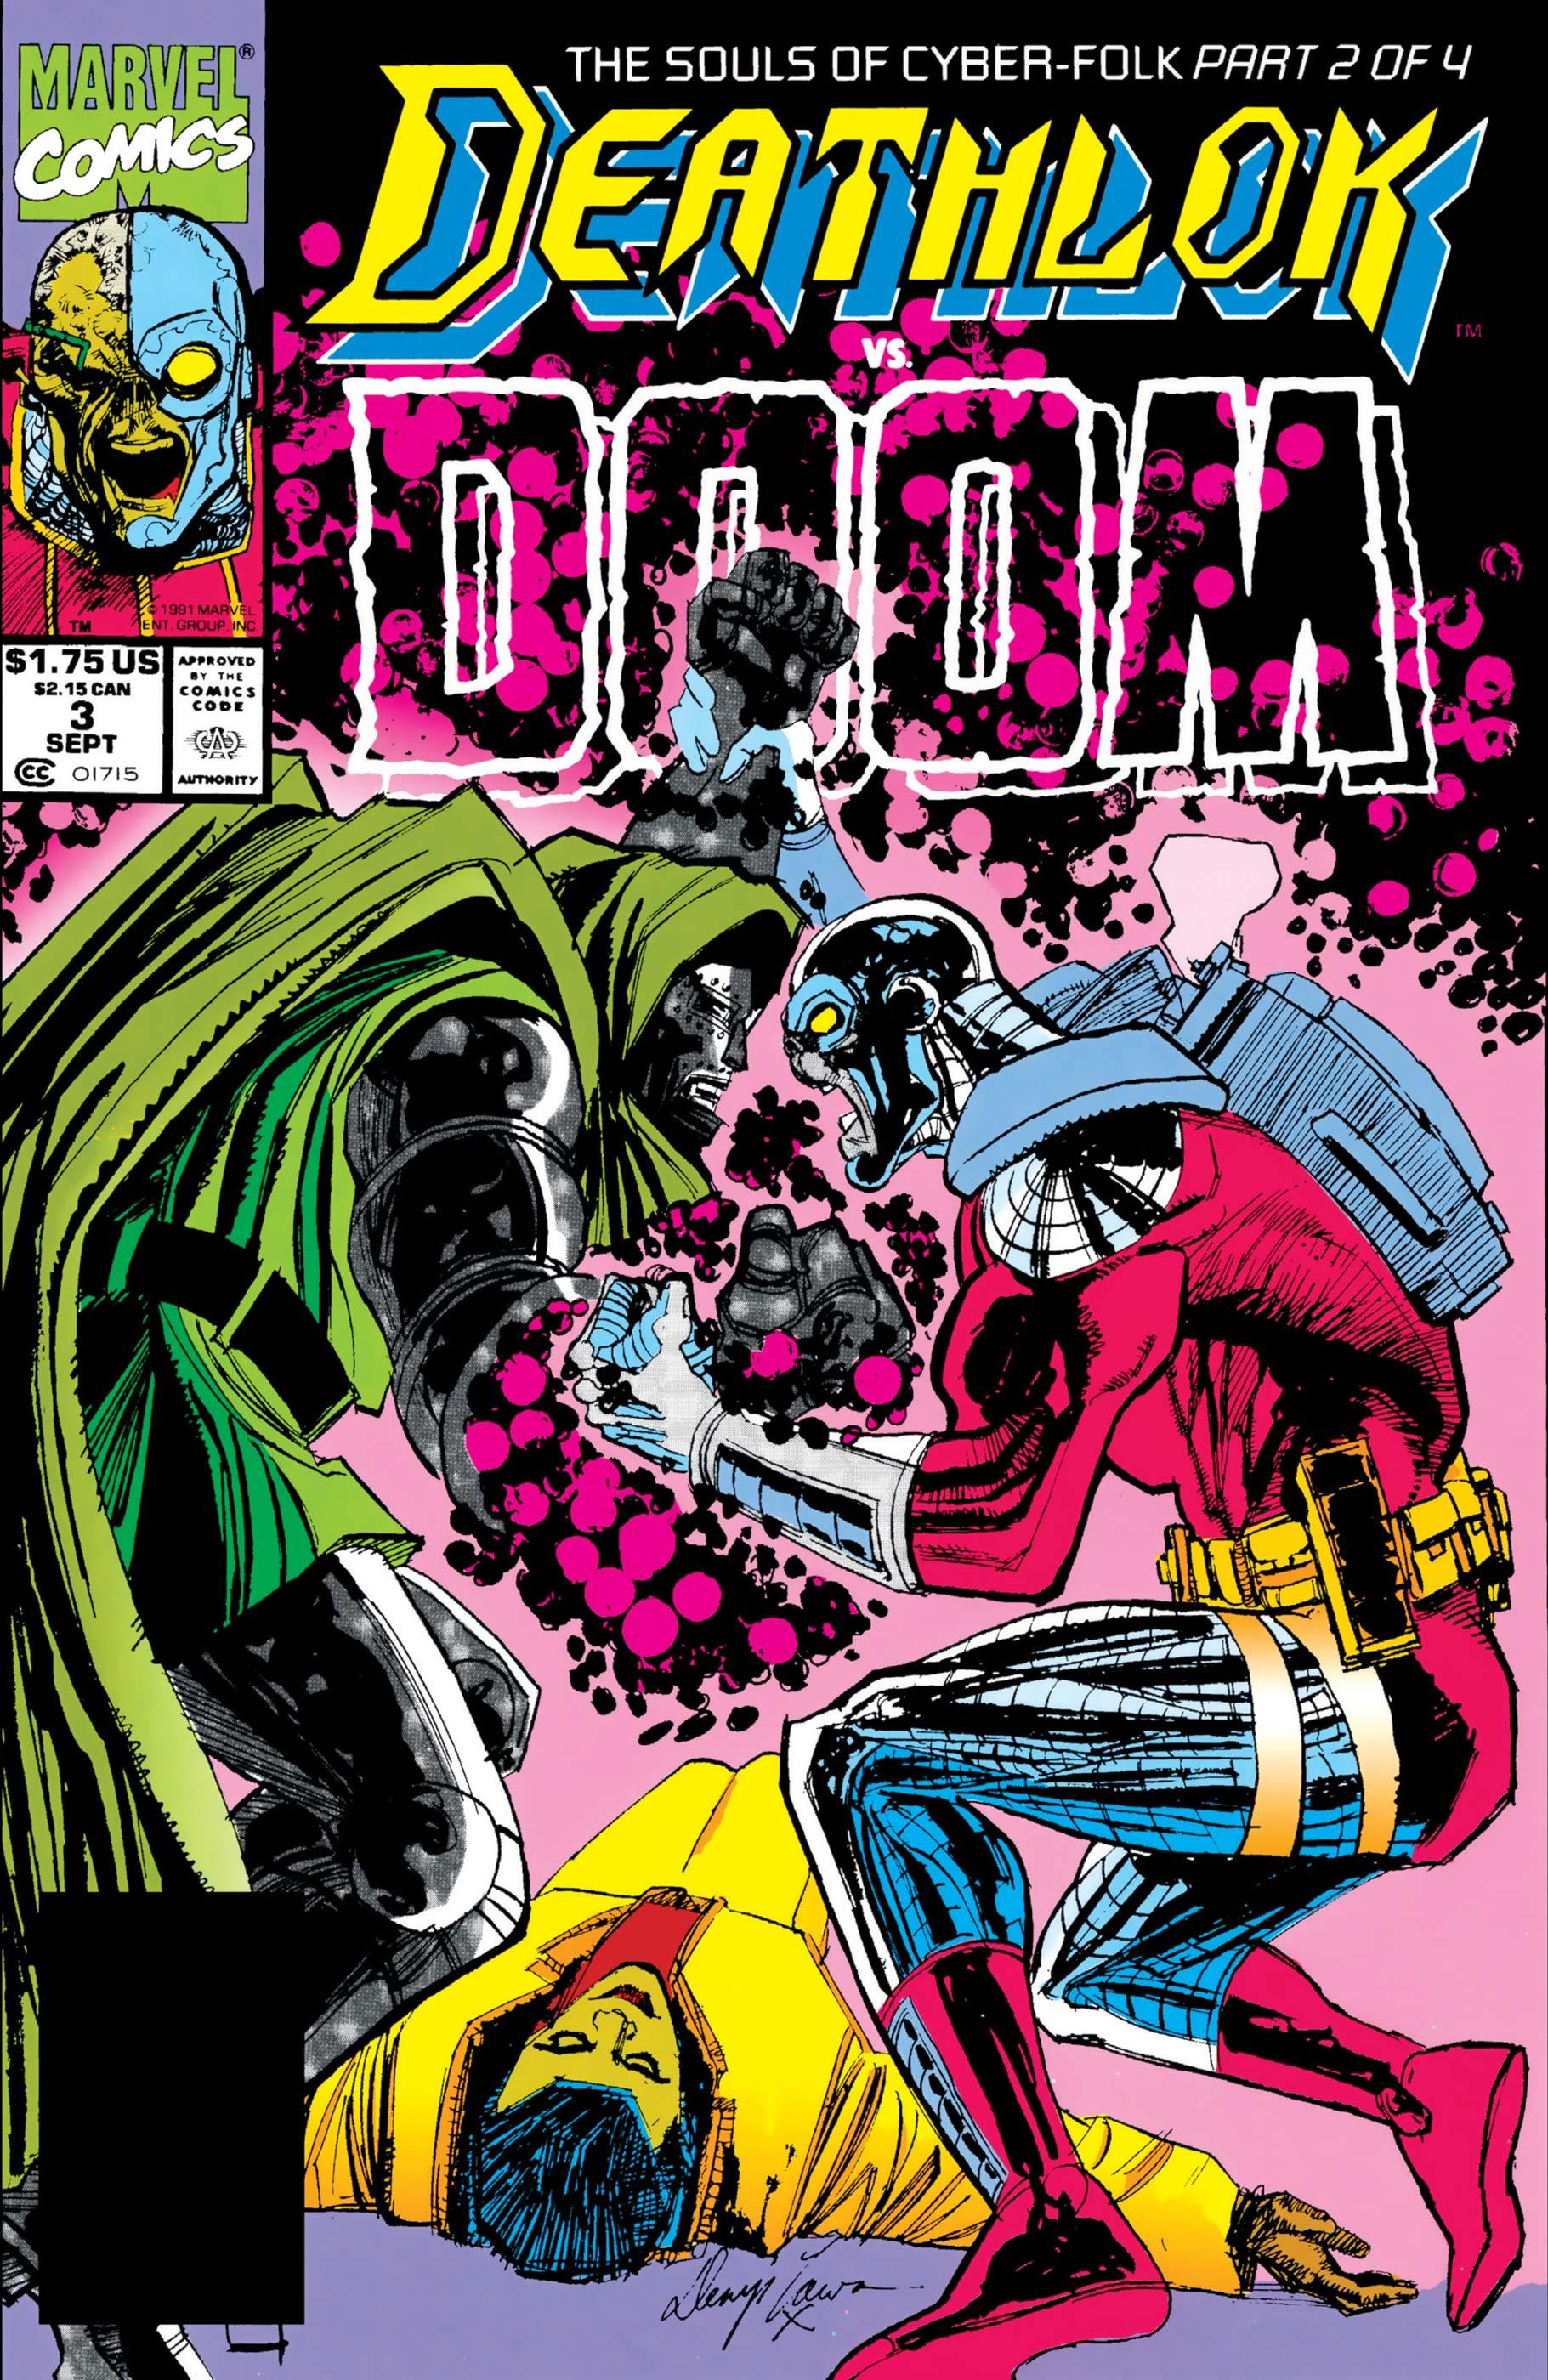 Deathlok (1991) #3